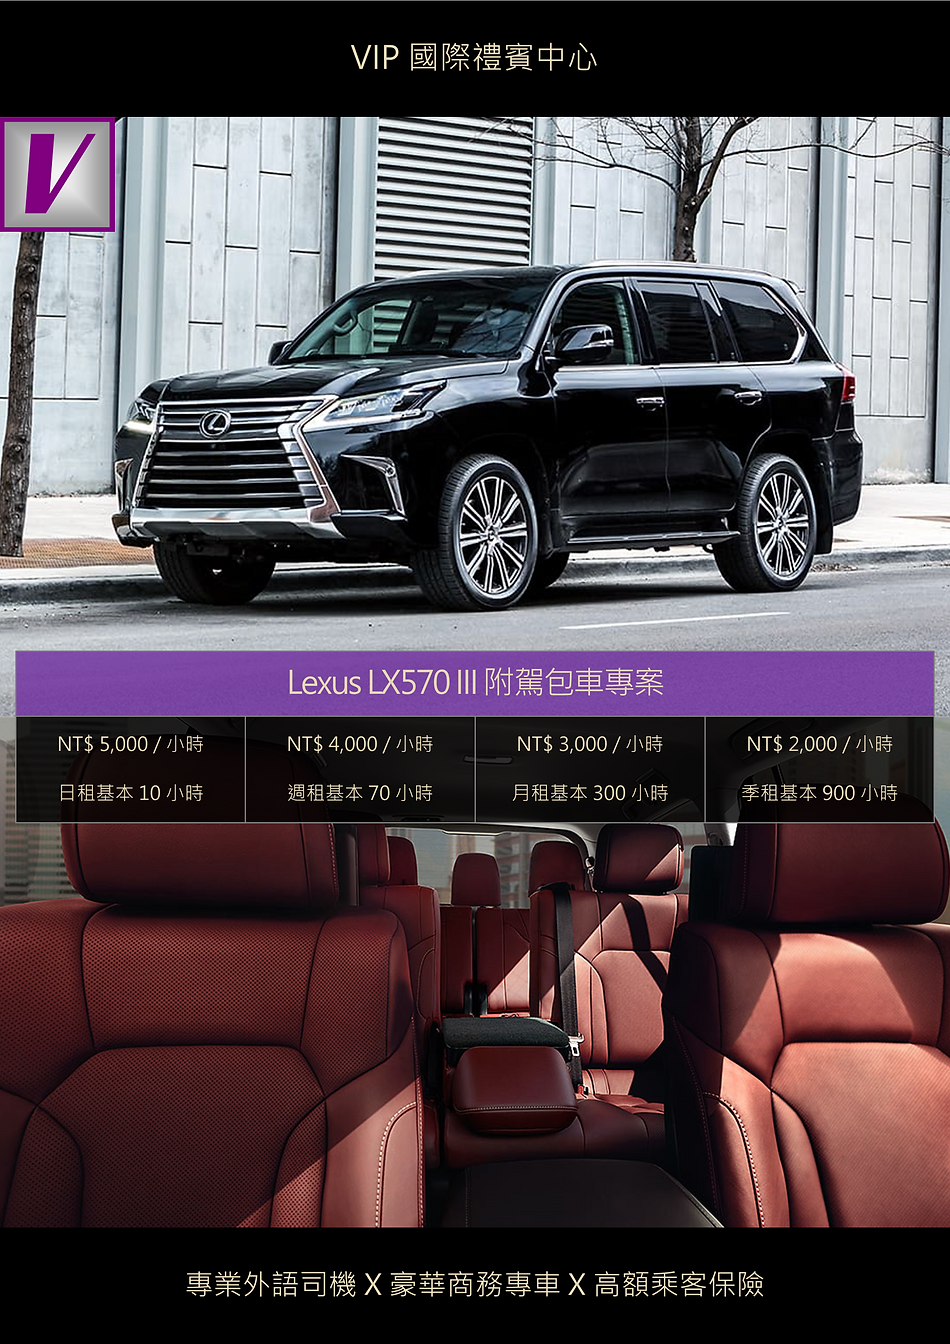 VIP國際禮賓中心 LEXUS LX570 III 附駕包車專案 DM.png